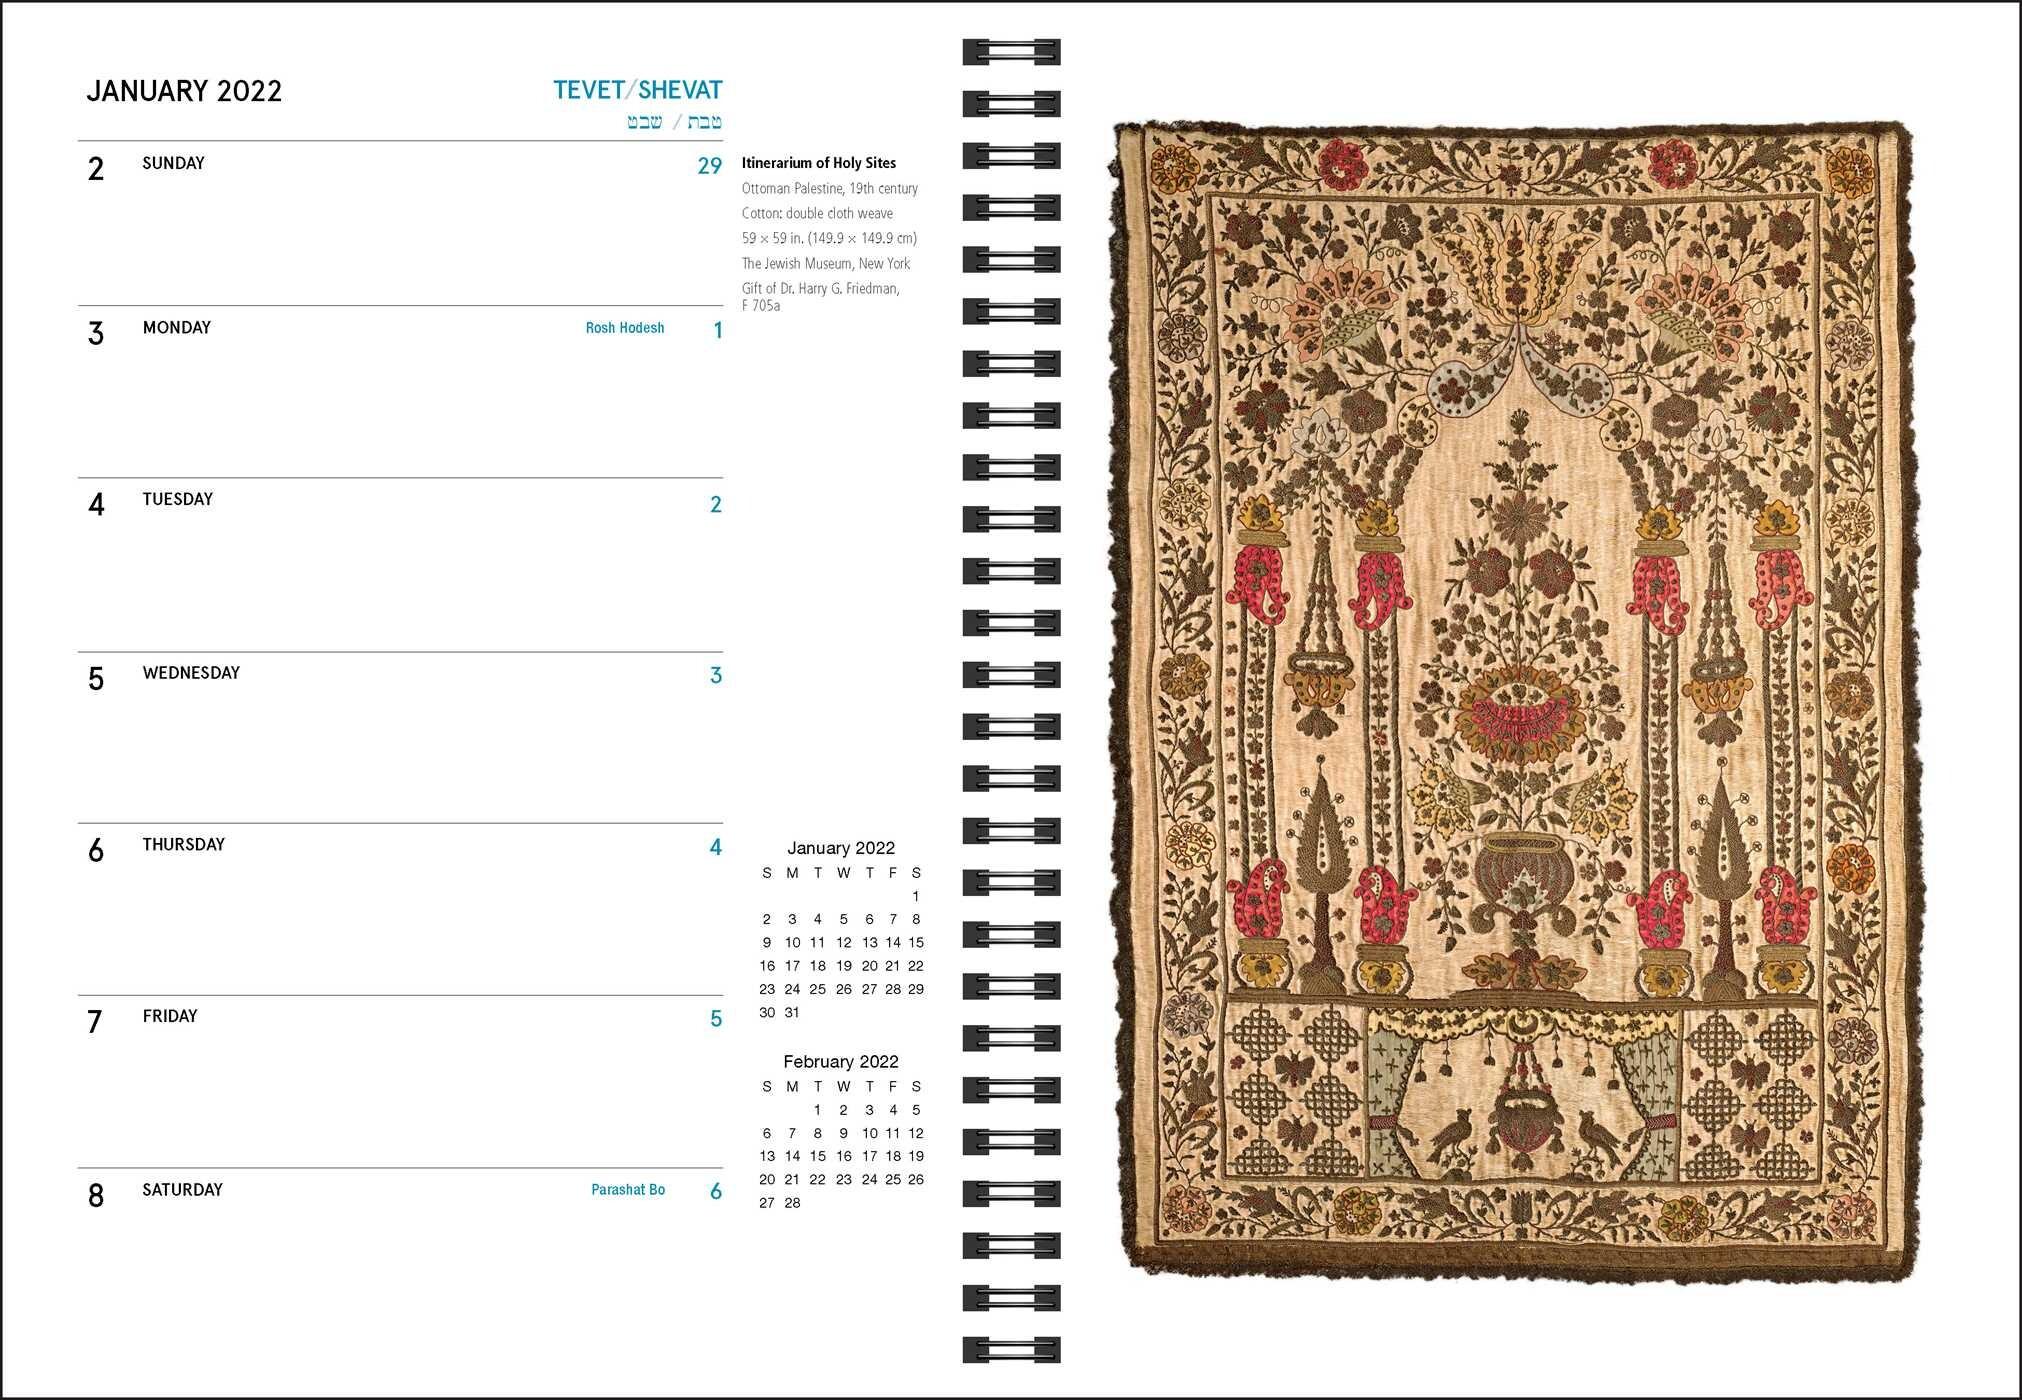 Torah Portion Calendar 2022.The Jewish Calendar 16 Month 2021 2022 Engagement Calendar Book Summary Video Official Publisher Page Simon Schuster